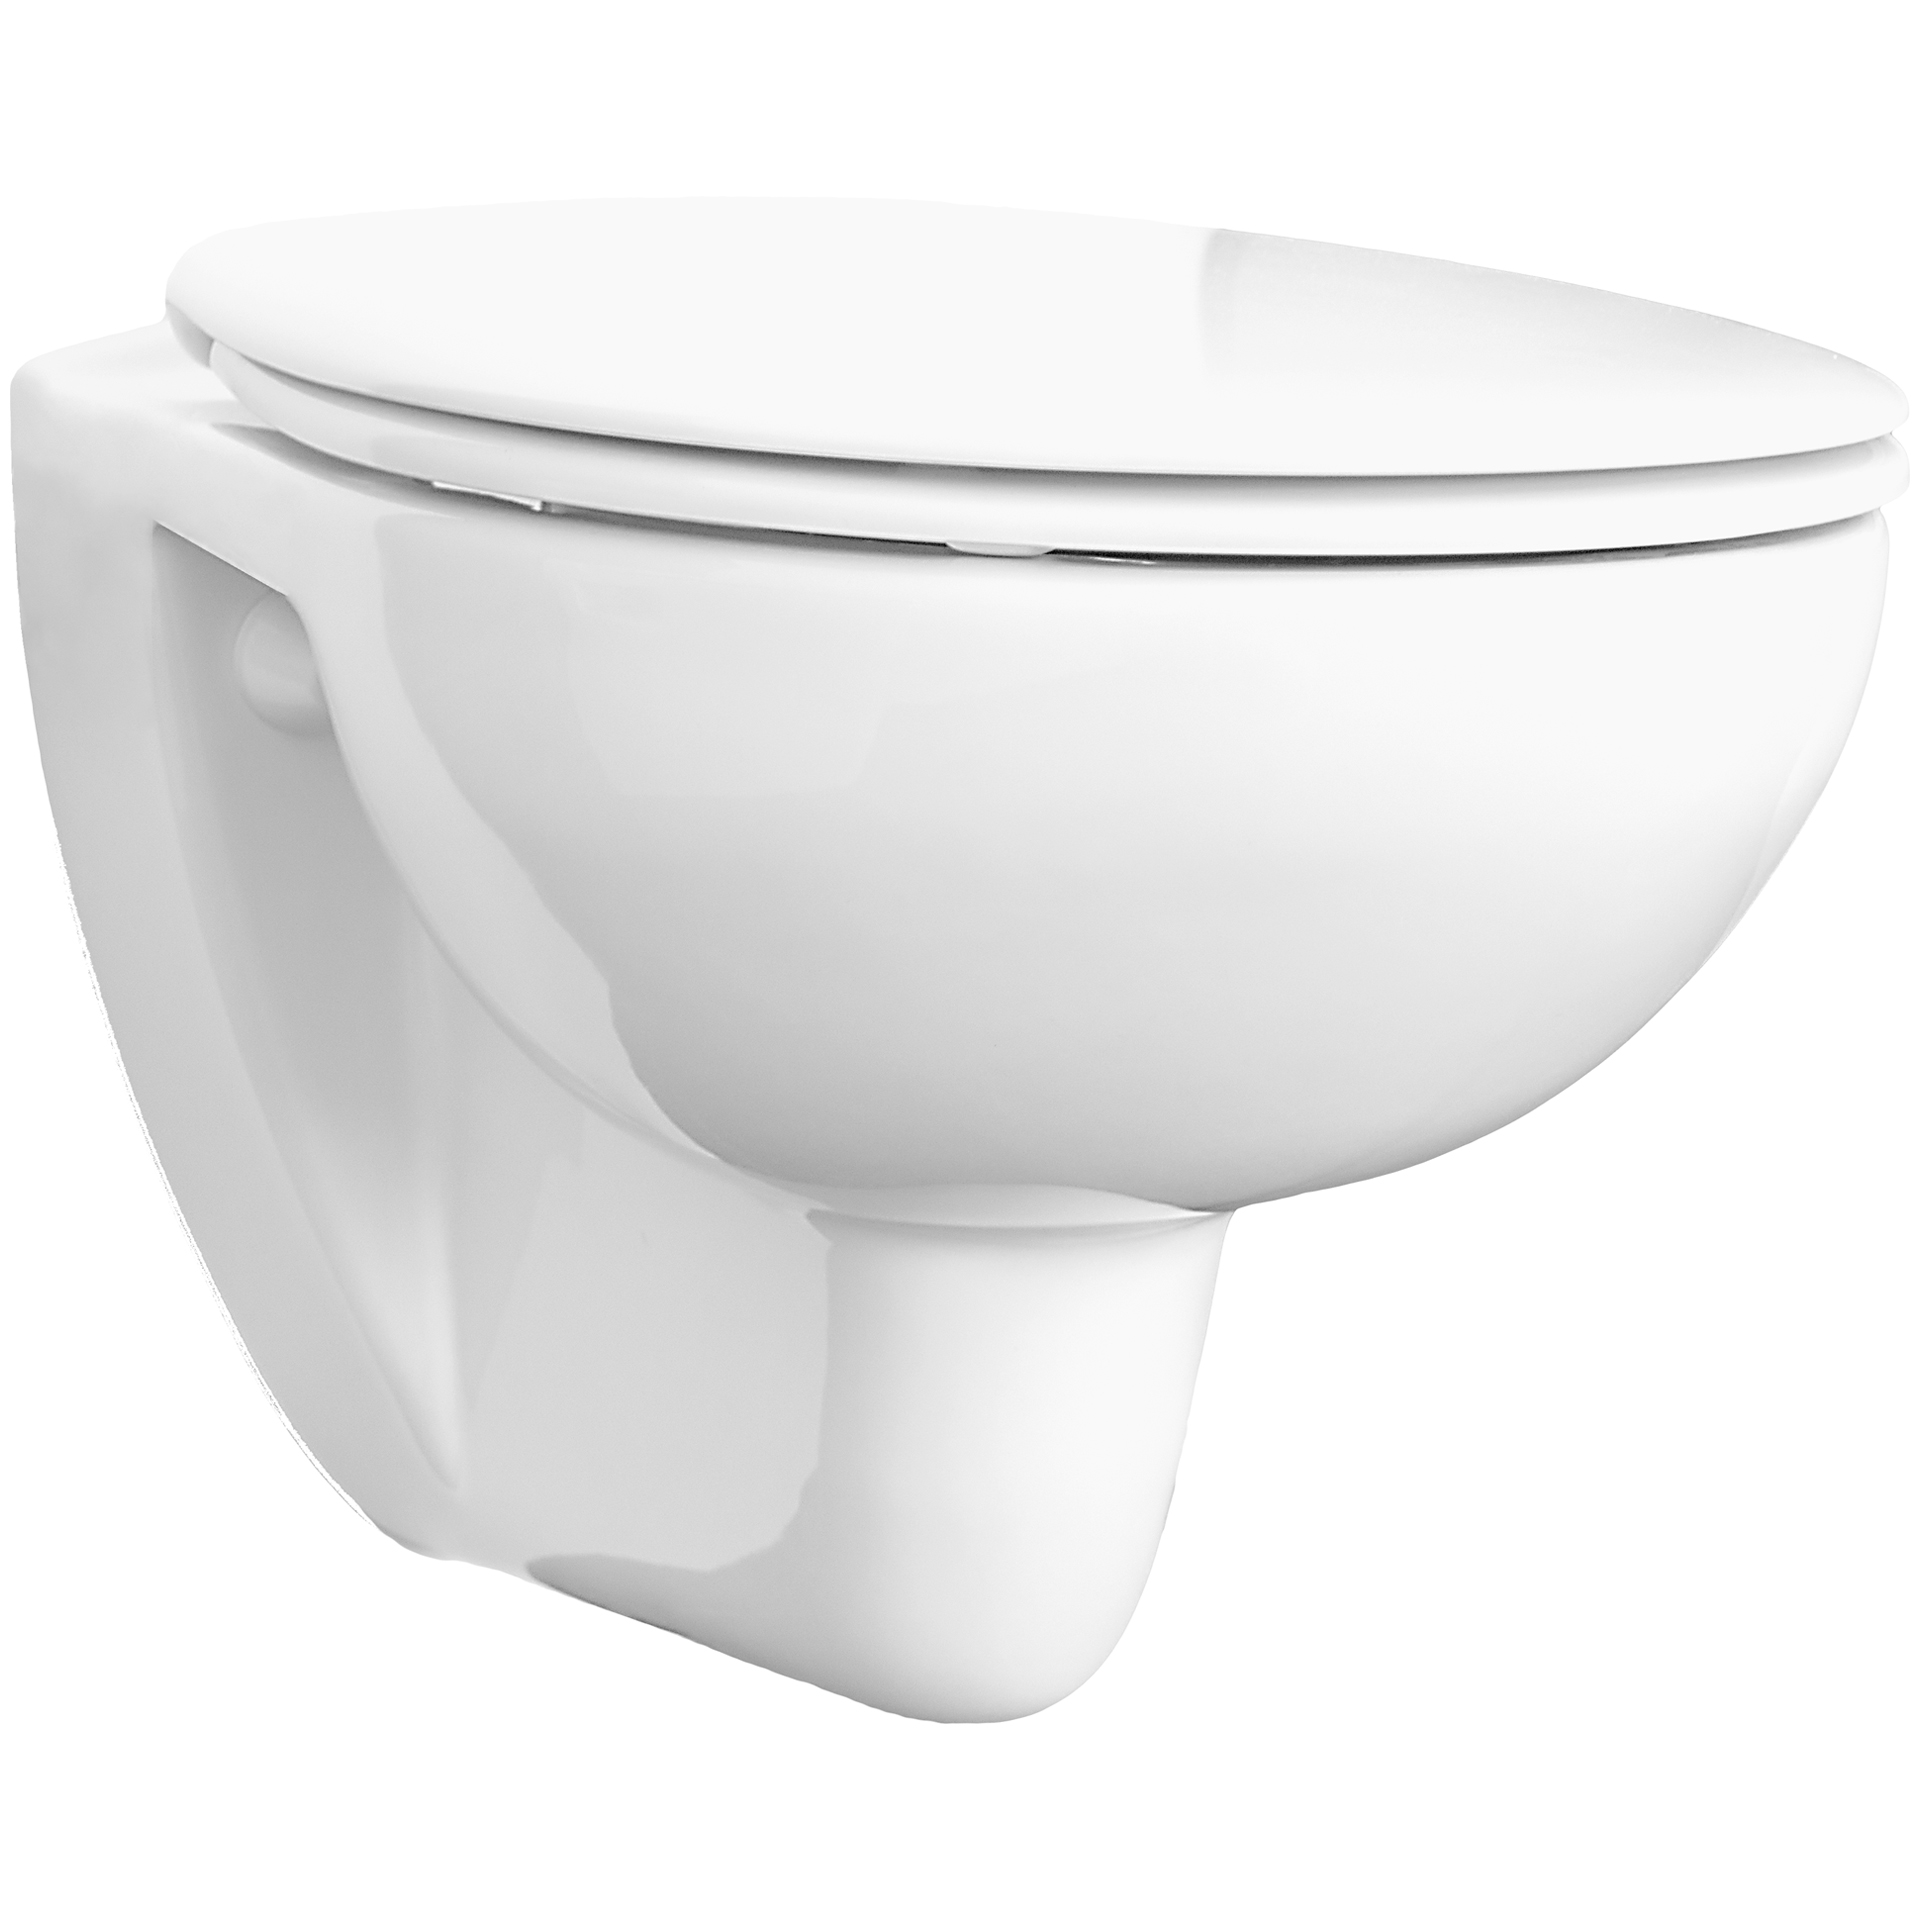 temtasi tek oa 5201 dusch wc temtasi preiswerte dusch wcs ohne elektronik direkt vom hersteller. Black Bedroom Furniture Sets. Home Design Ideas